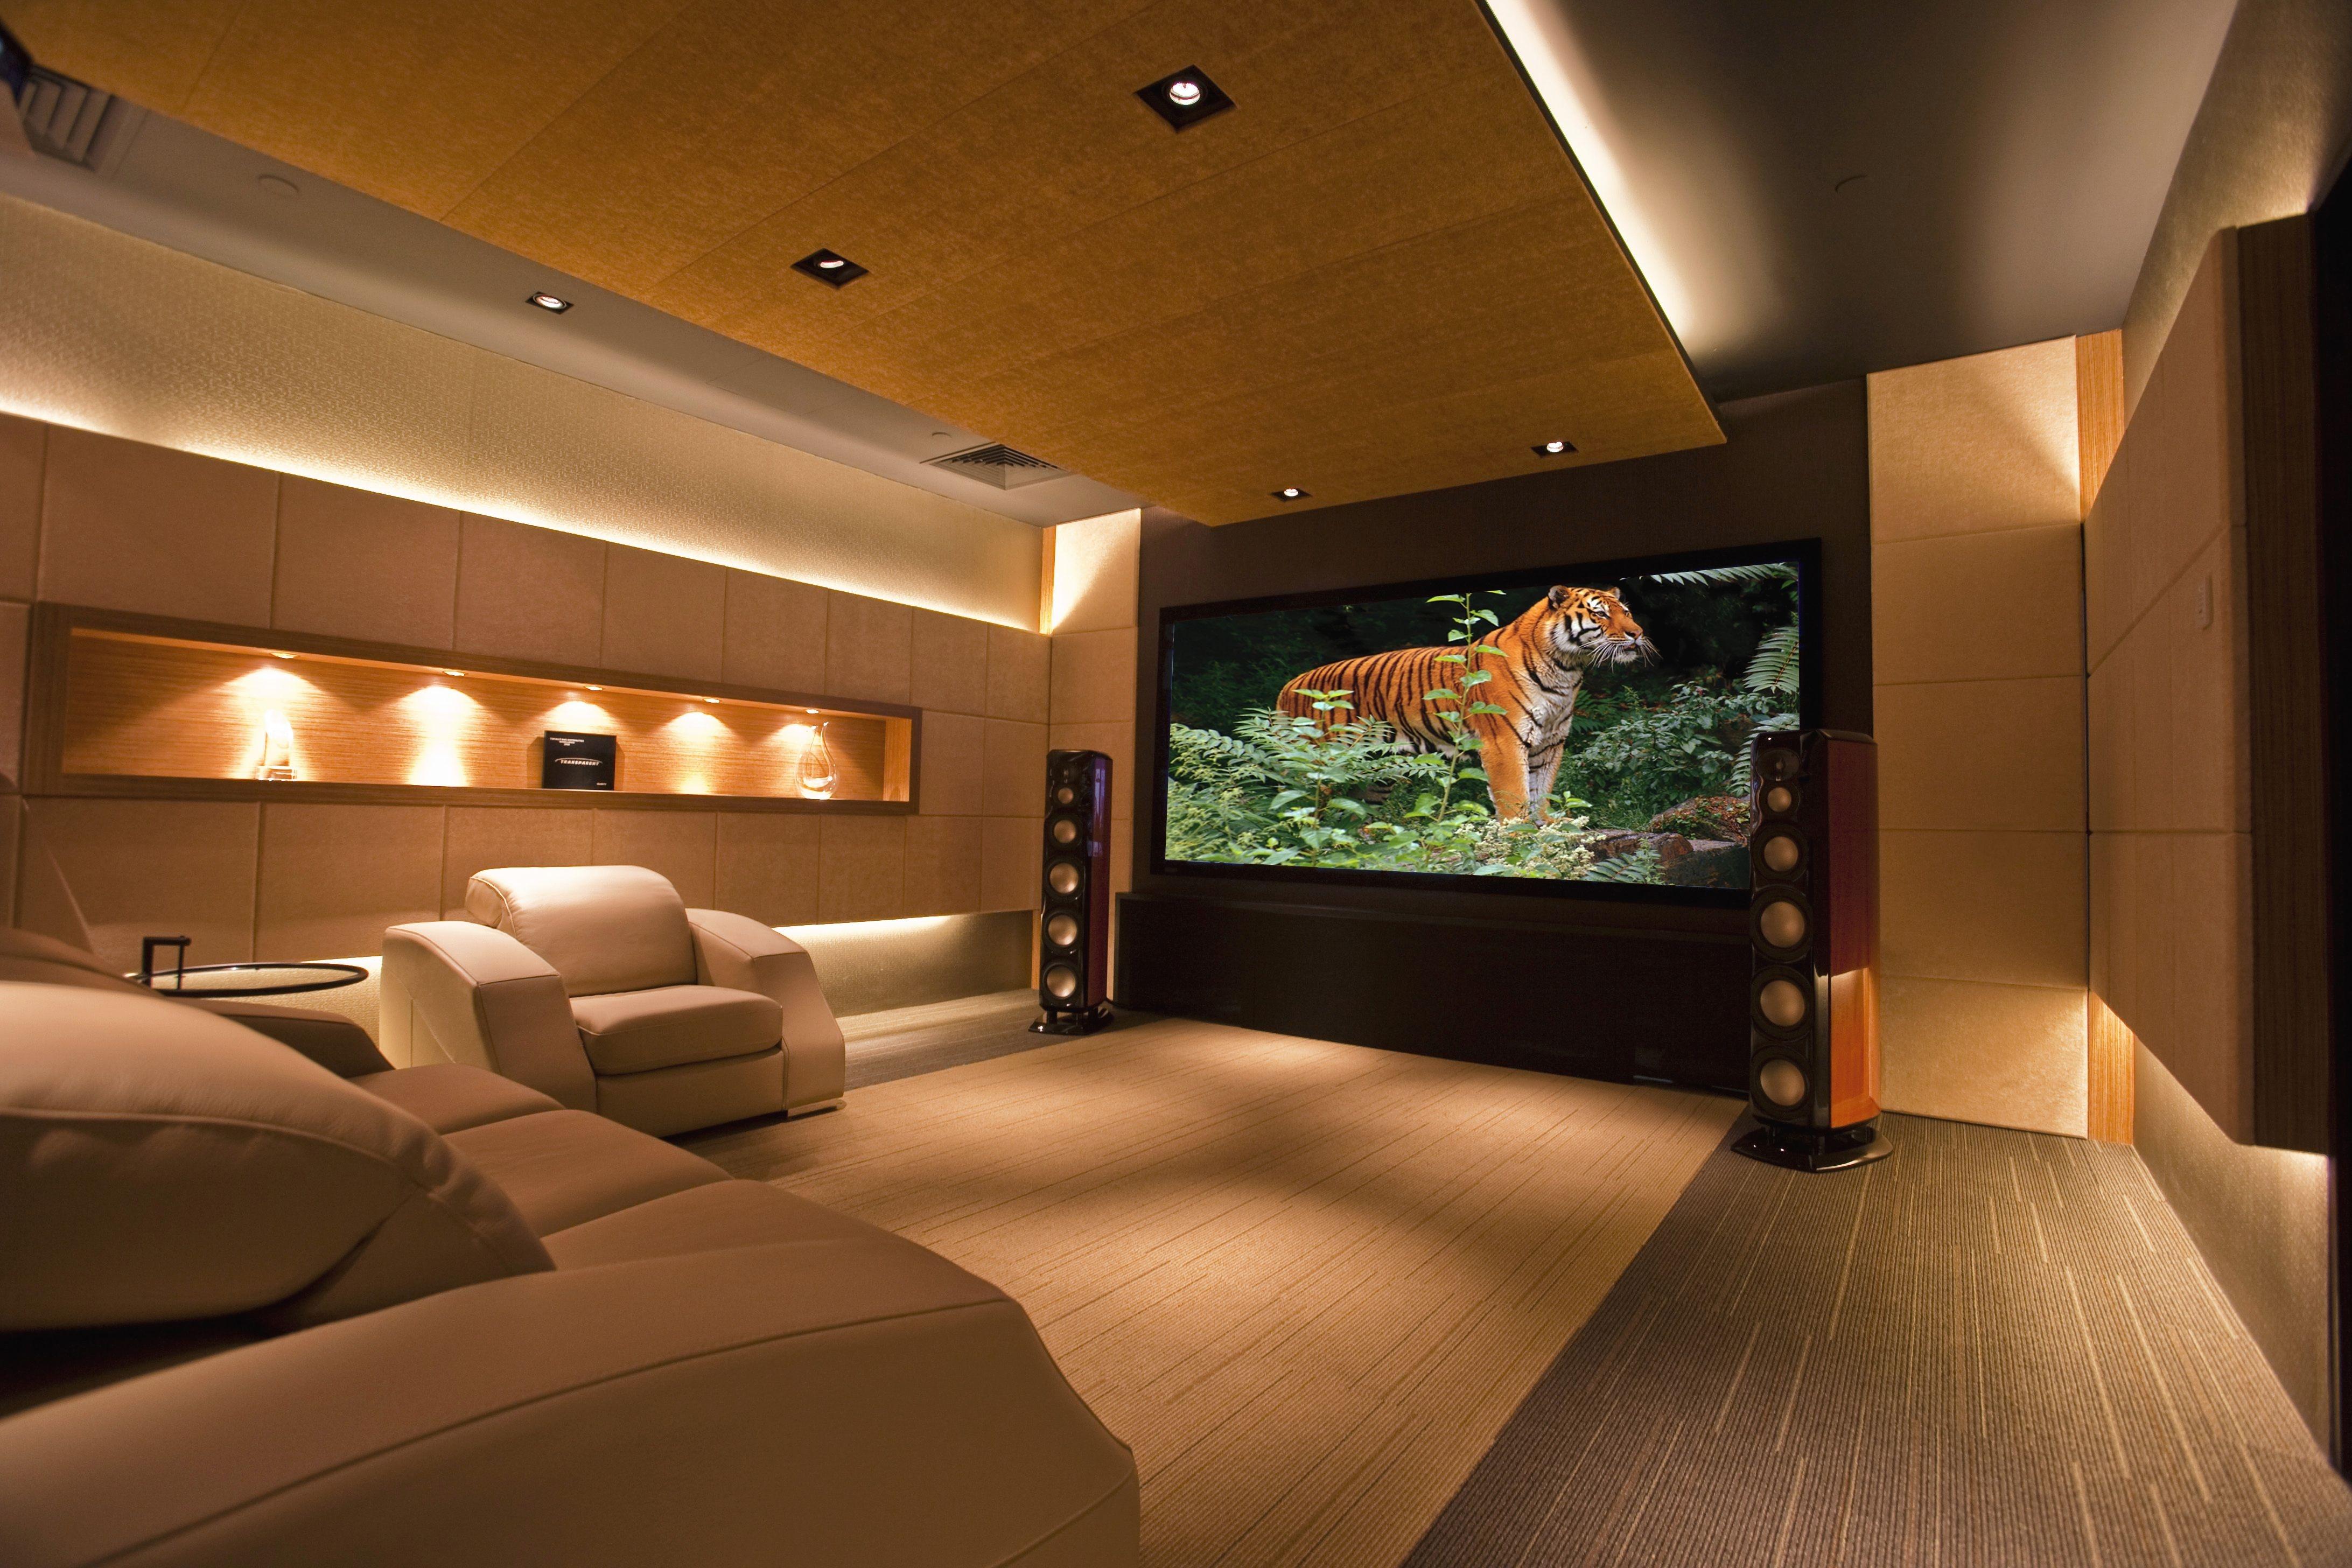 Интерьер комнат домашний кинотеатр фото